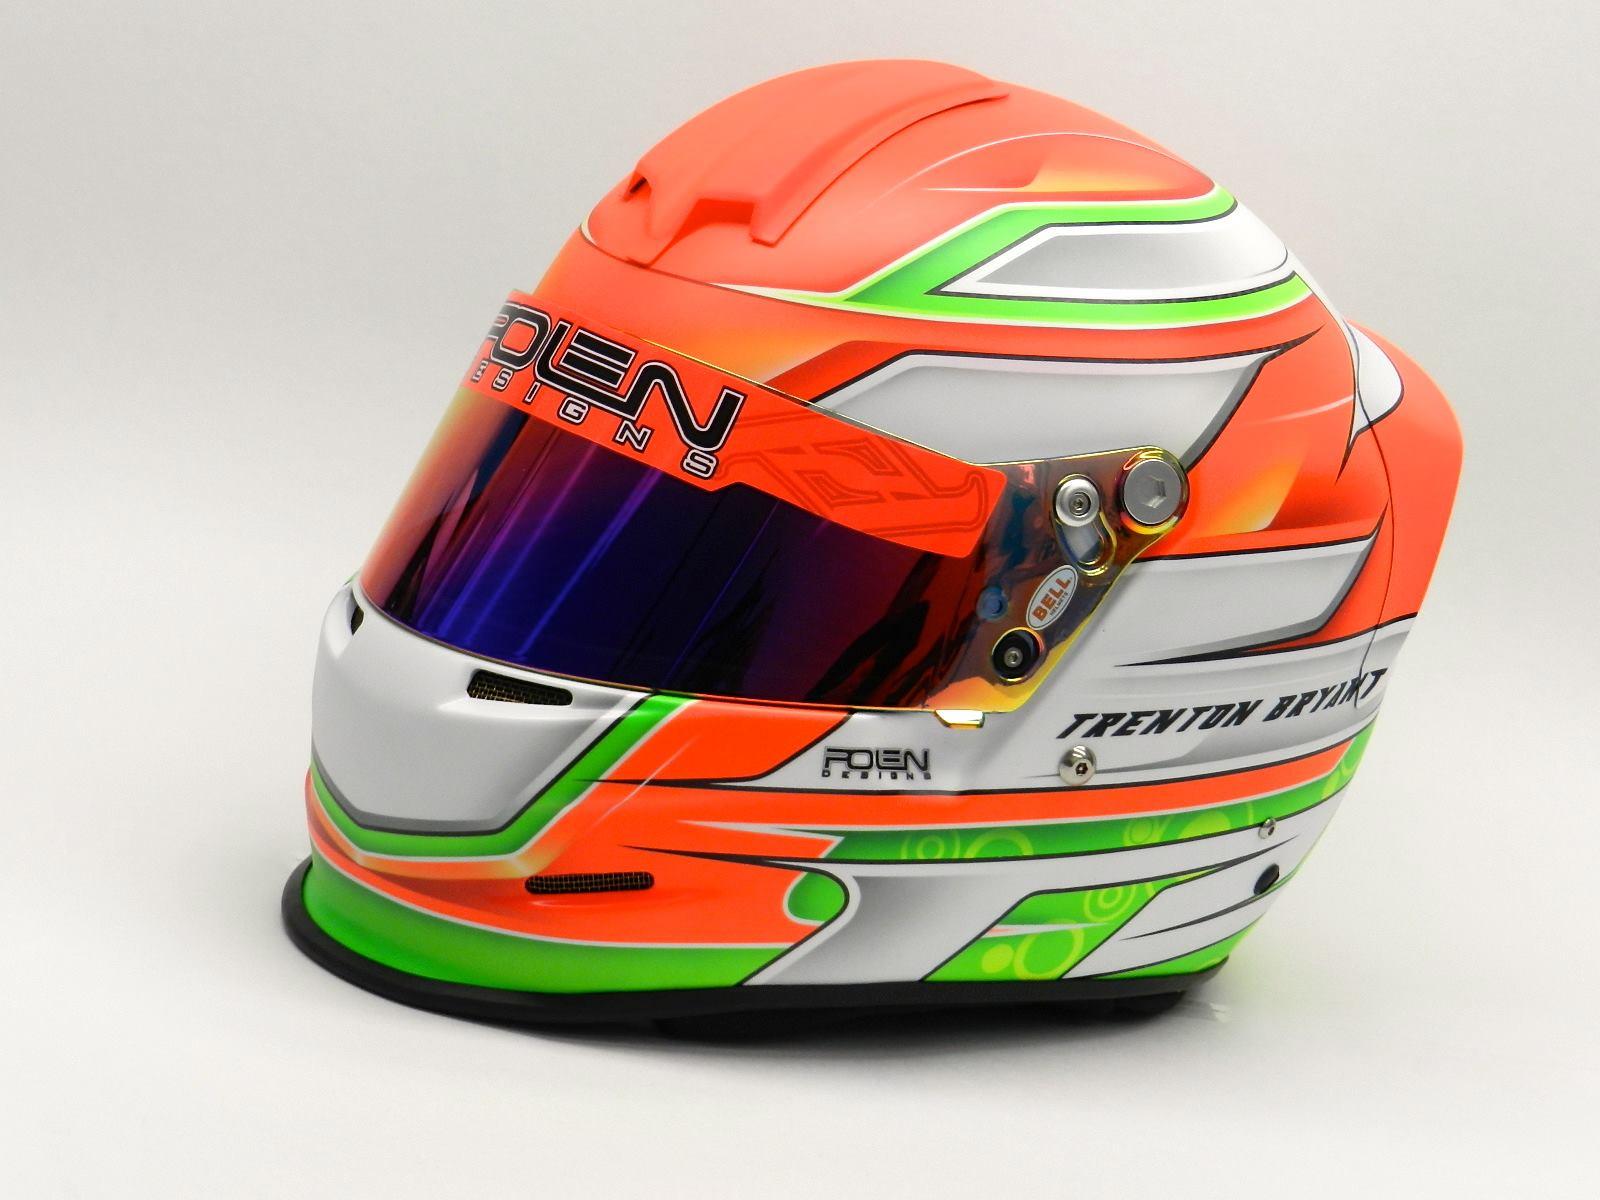 Helm Design helm 37 bell gp 2 t bryant 2015 by polen designs inc